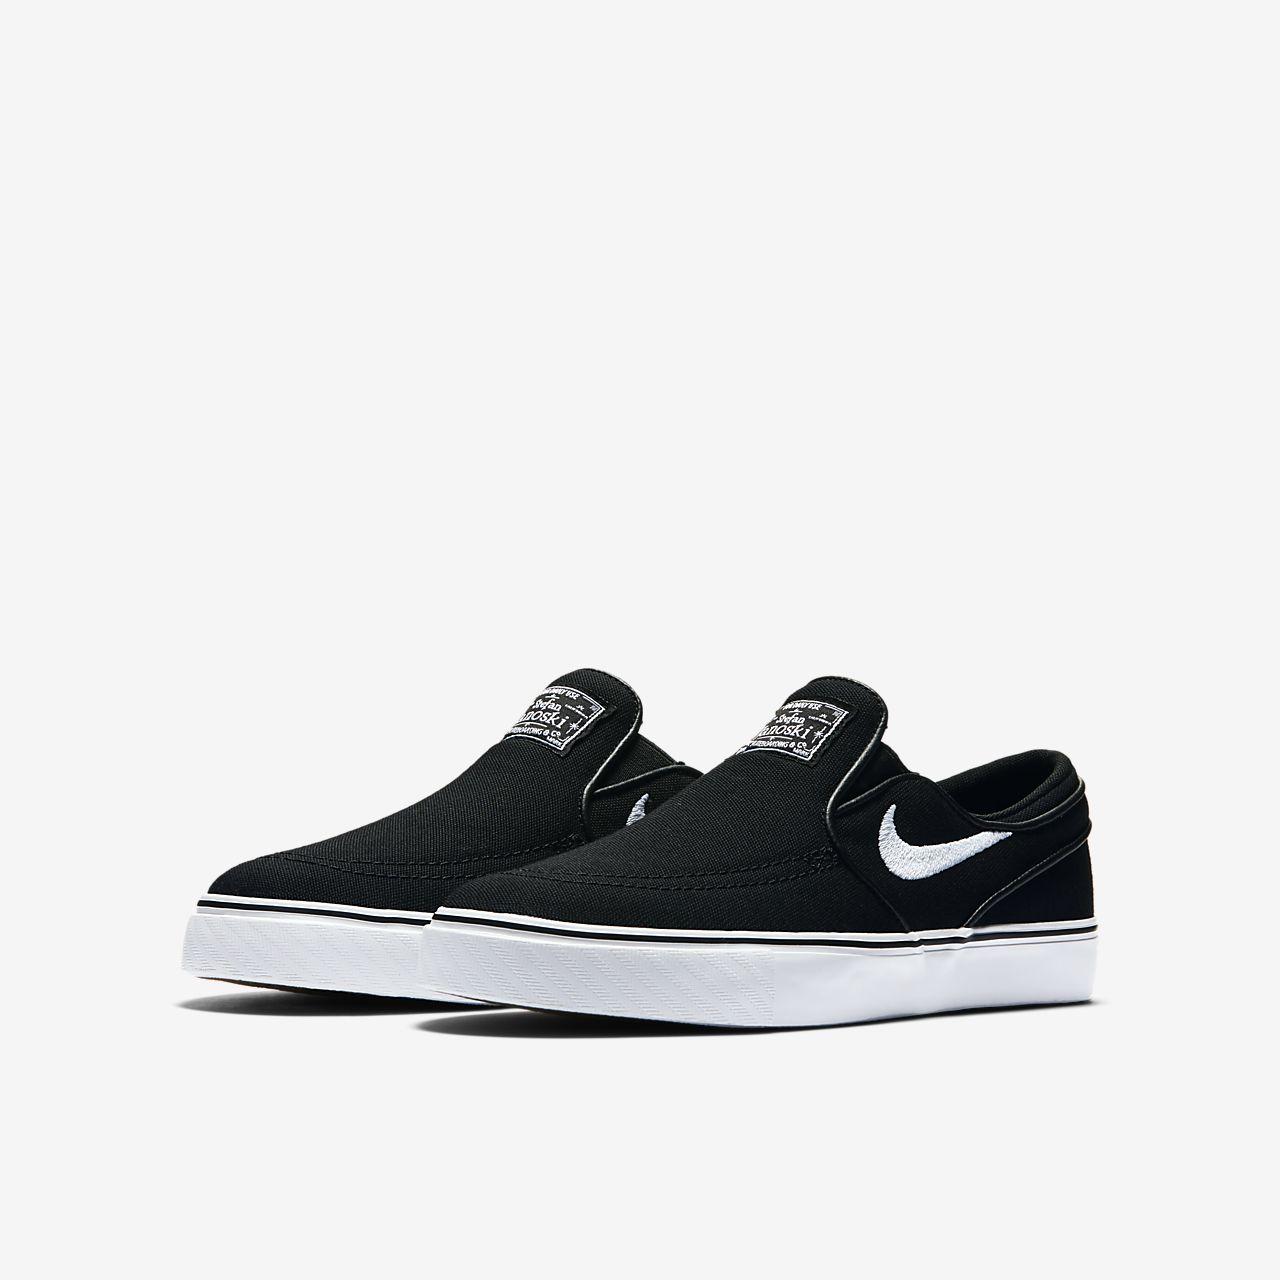 reputable site 95c73 eb2c9 ... Nike SB Stefan Janoski Canvas Slip-on Big Kids  Skateboarding Shoe